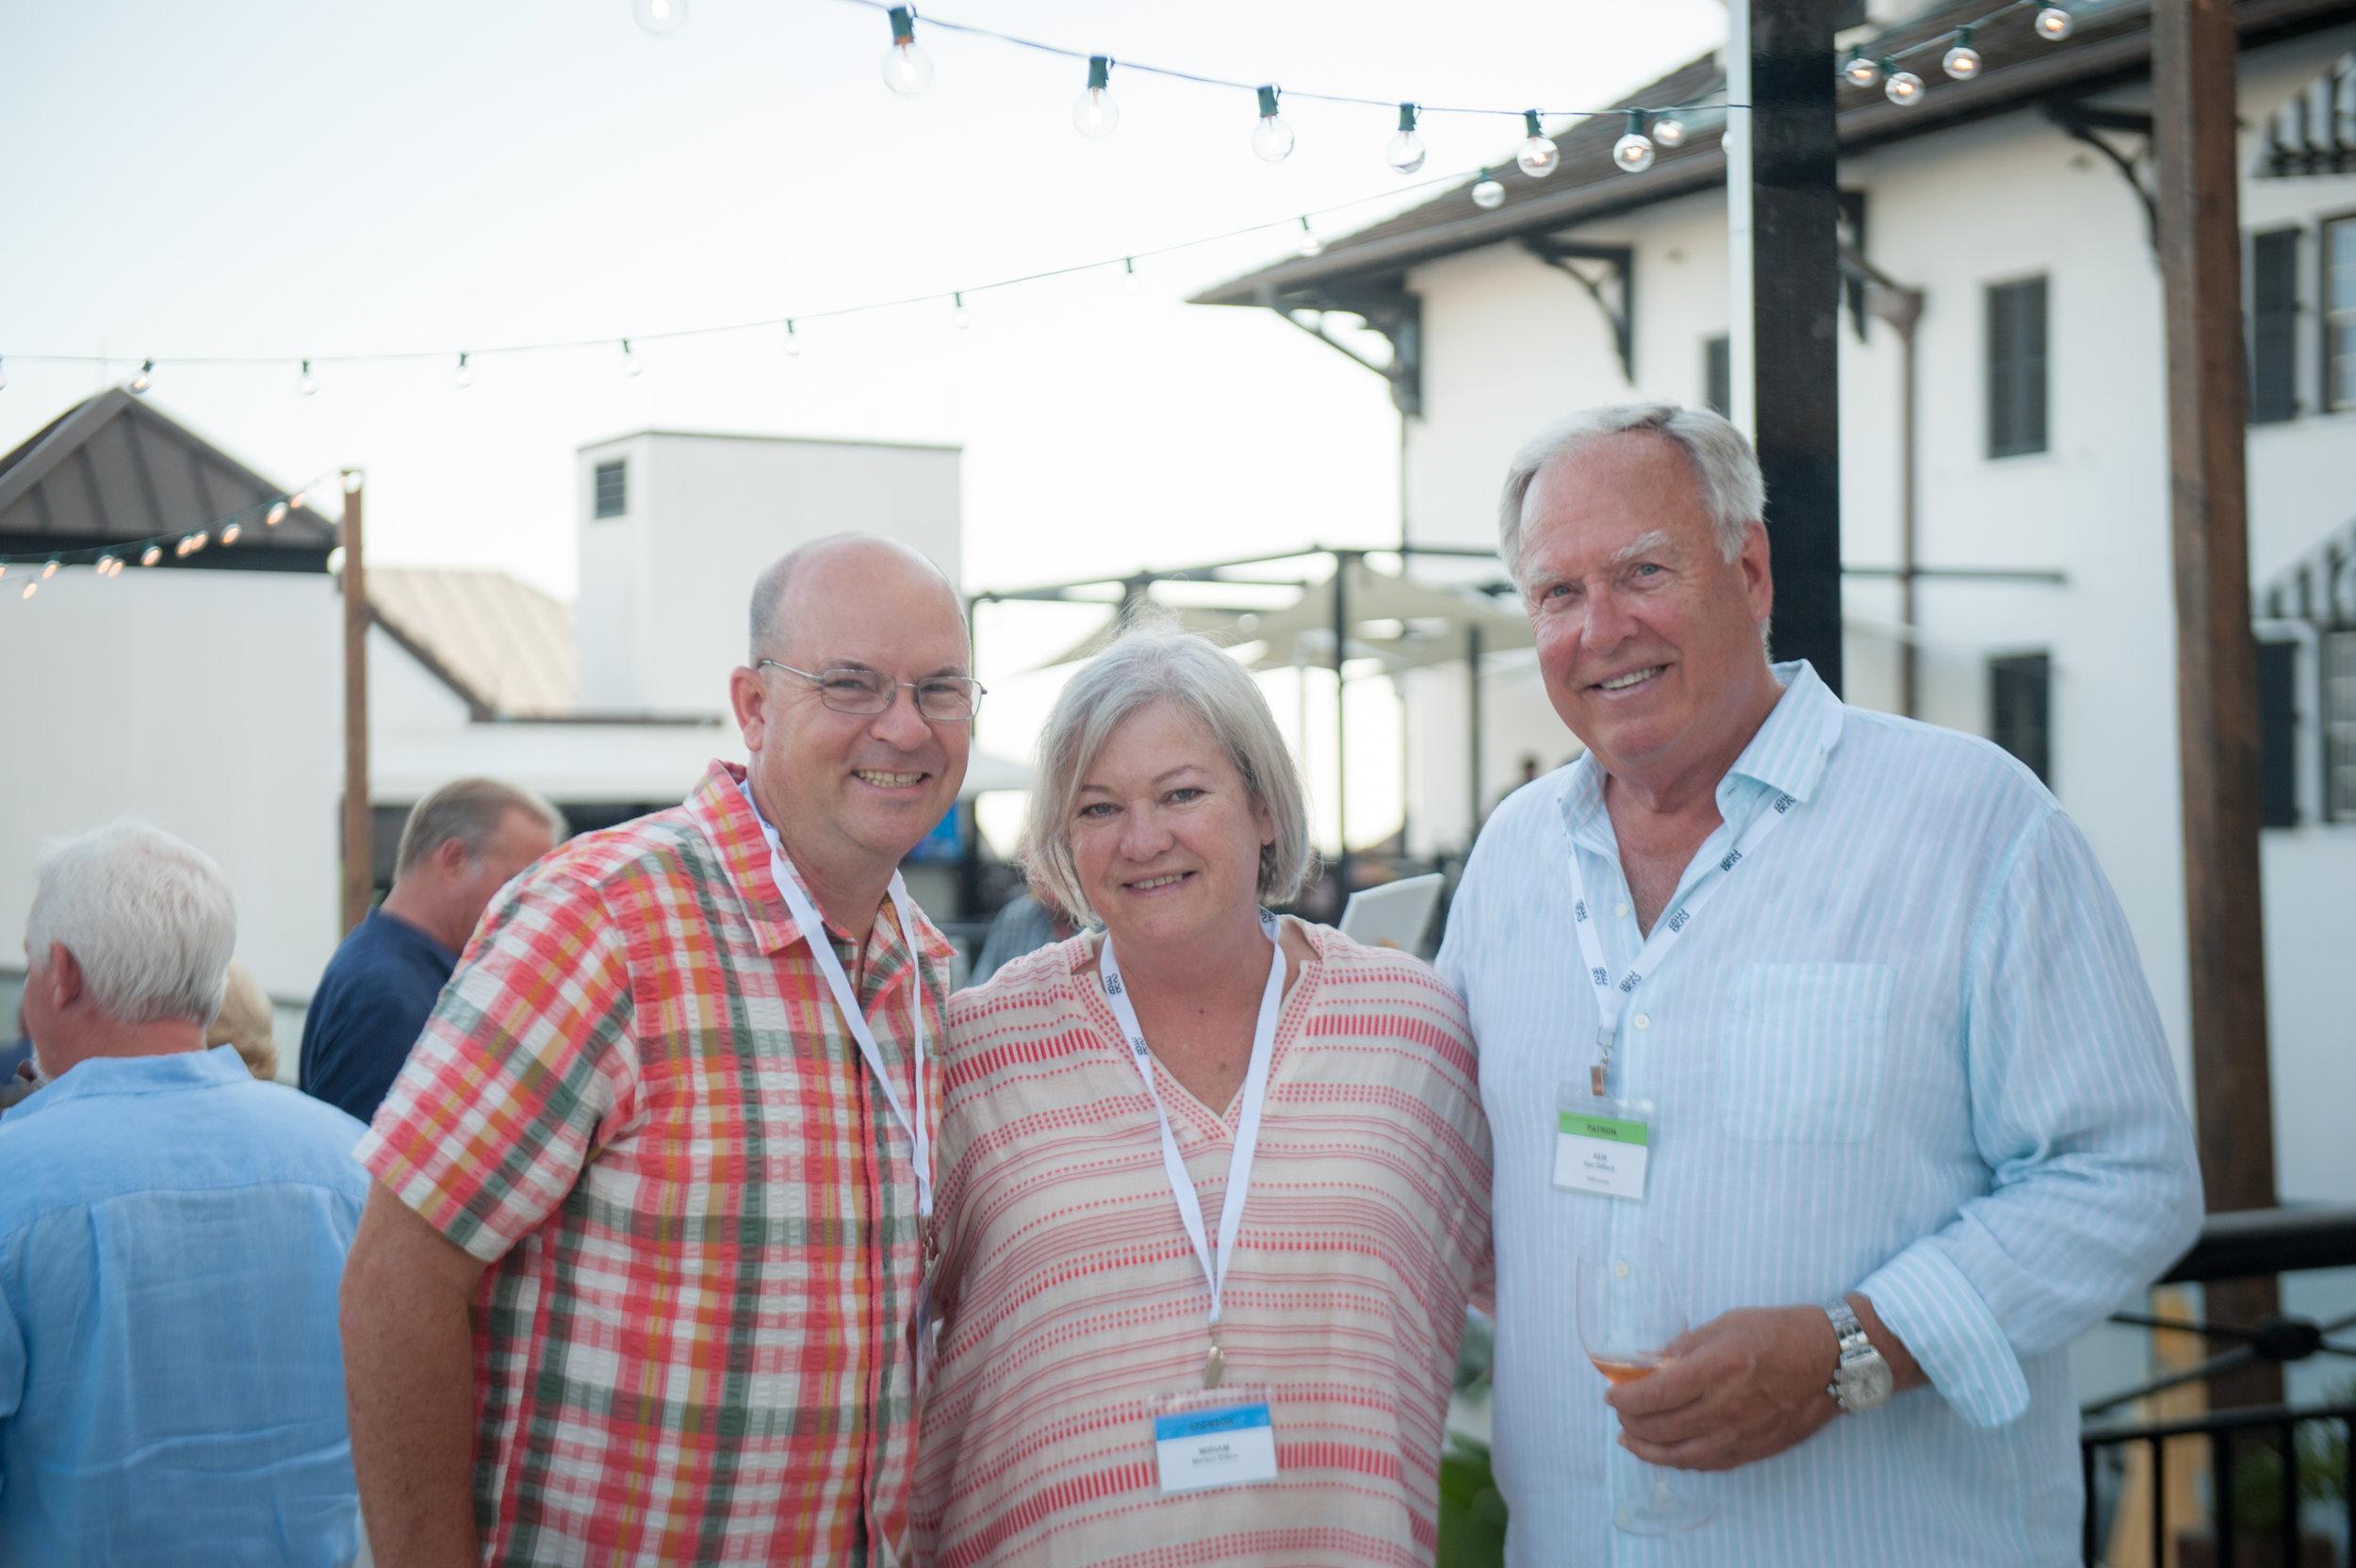 DSC_0009-2 James, Miriam and Ken.jpg